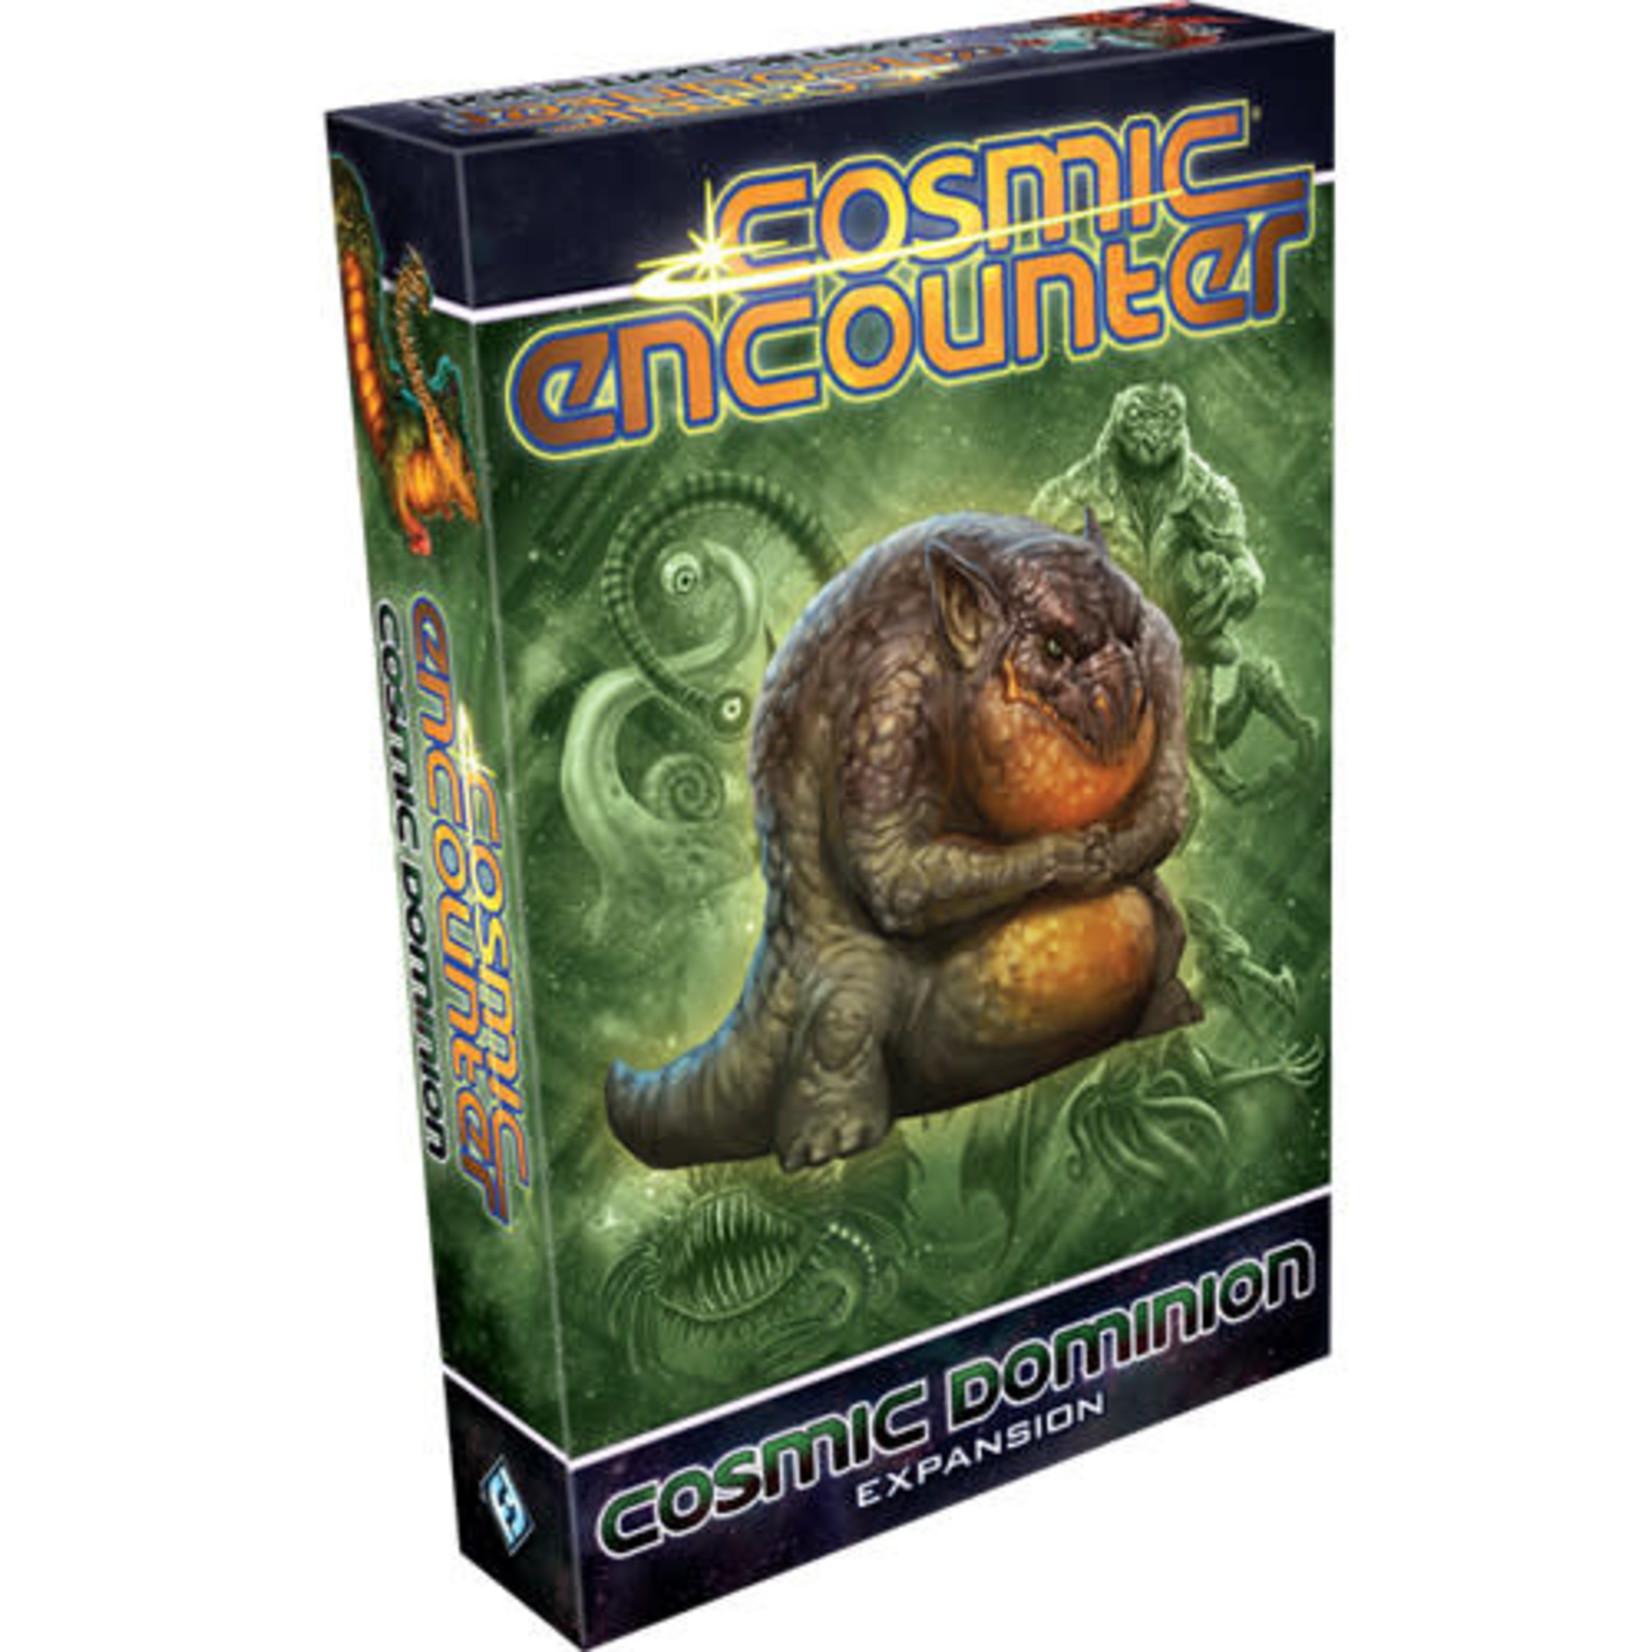 Cosmic Encounters: Cosmic Dominion